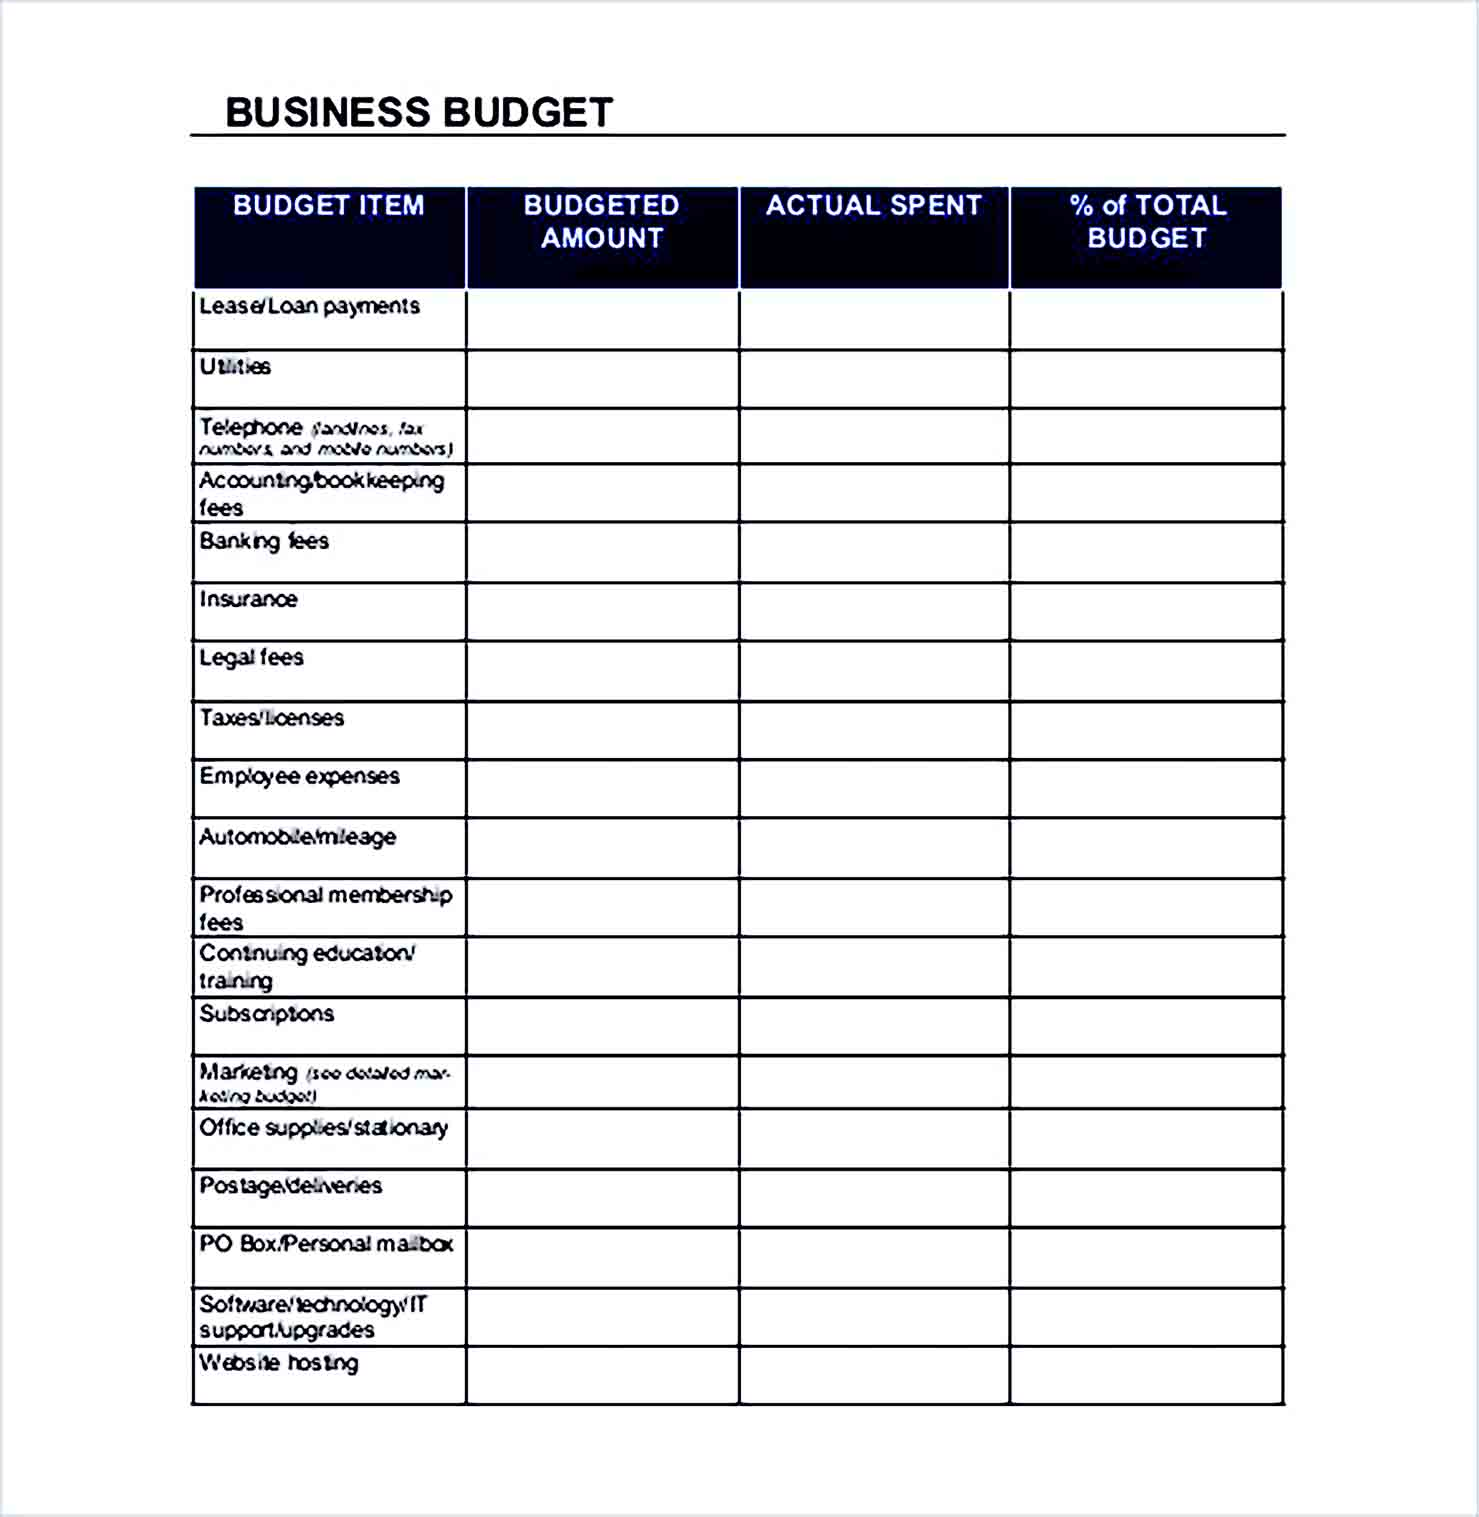 Sample Business Budget Spreadsheet